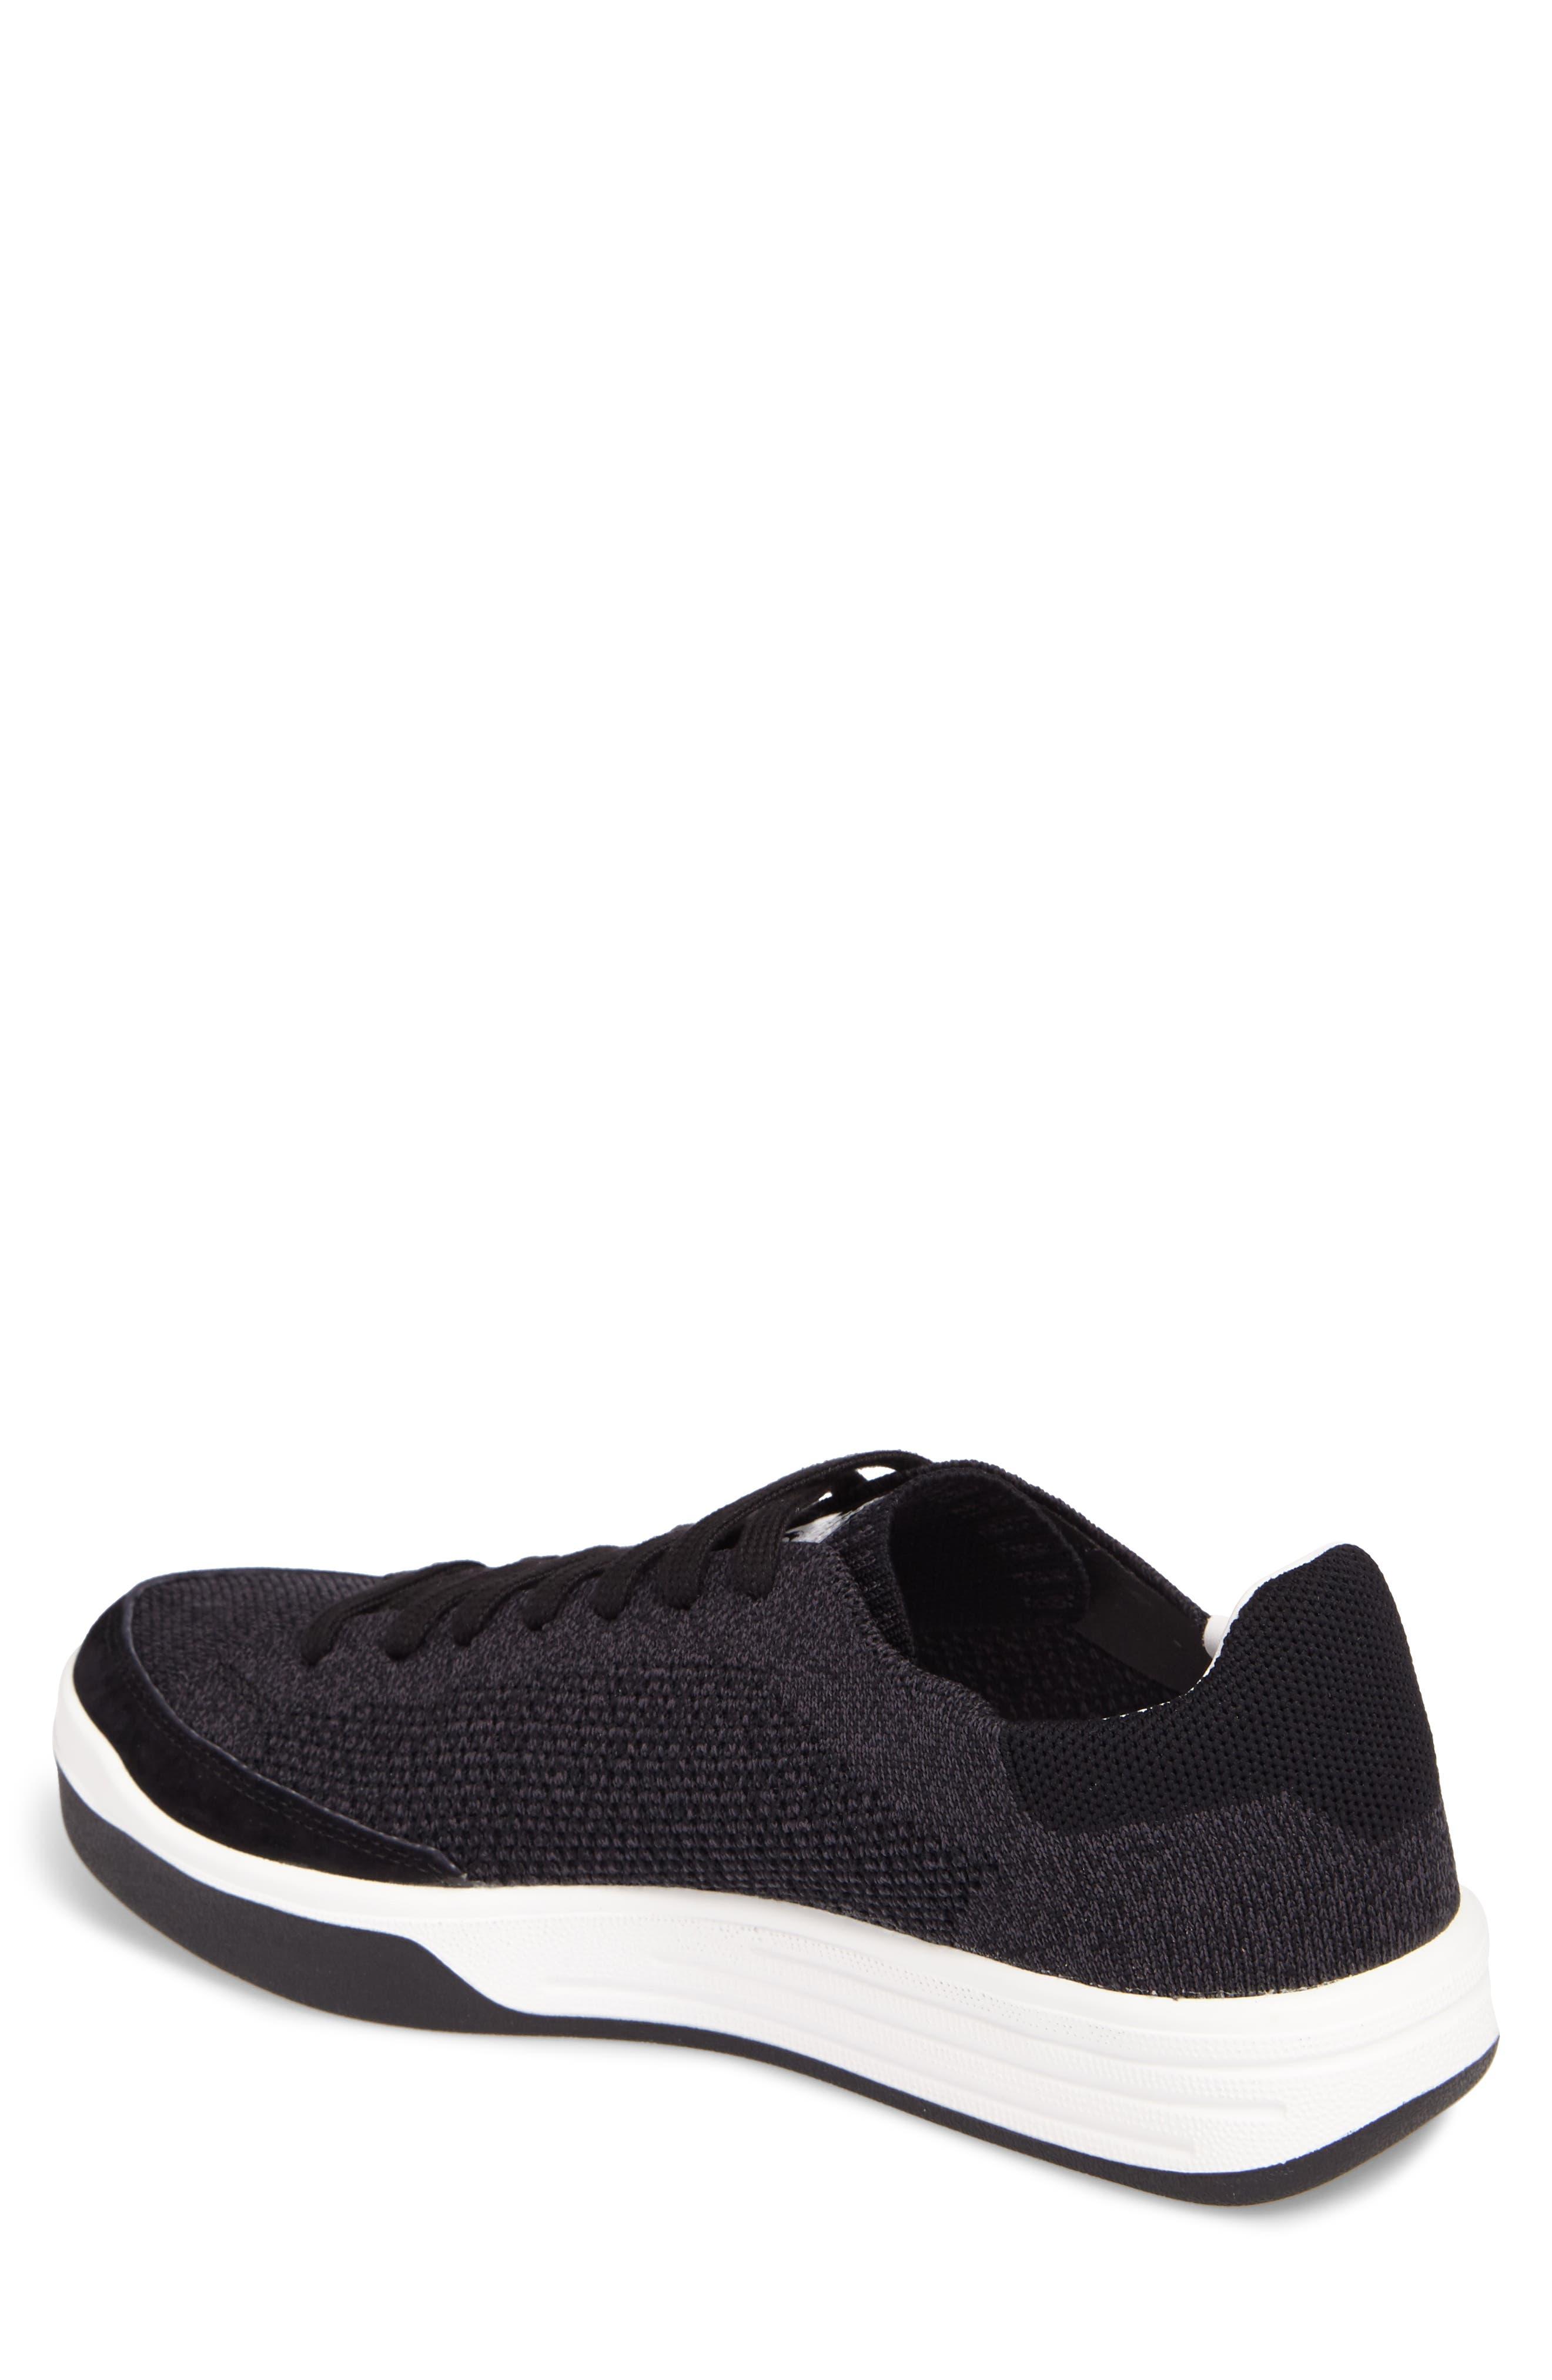 Rod Laver Super Primeknit Sneaker,                             Alternate thumbnail 2, color,                             001